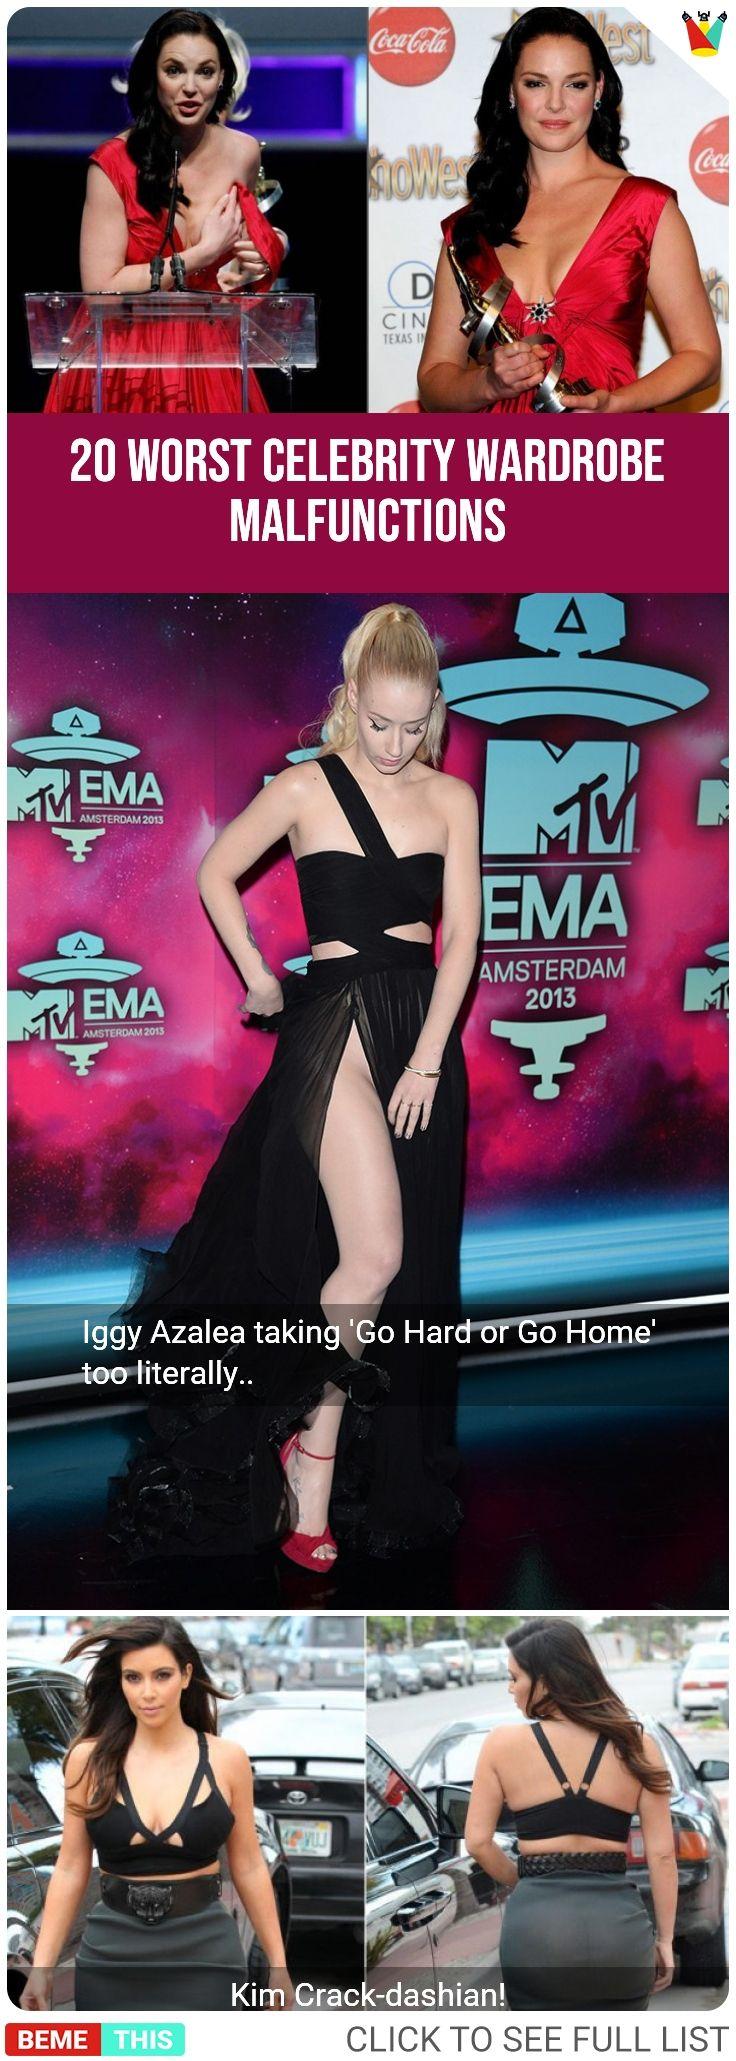 Worst Celebrity Wardrobe Malfunctions of 2015 - Nicki ...